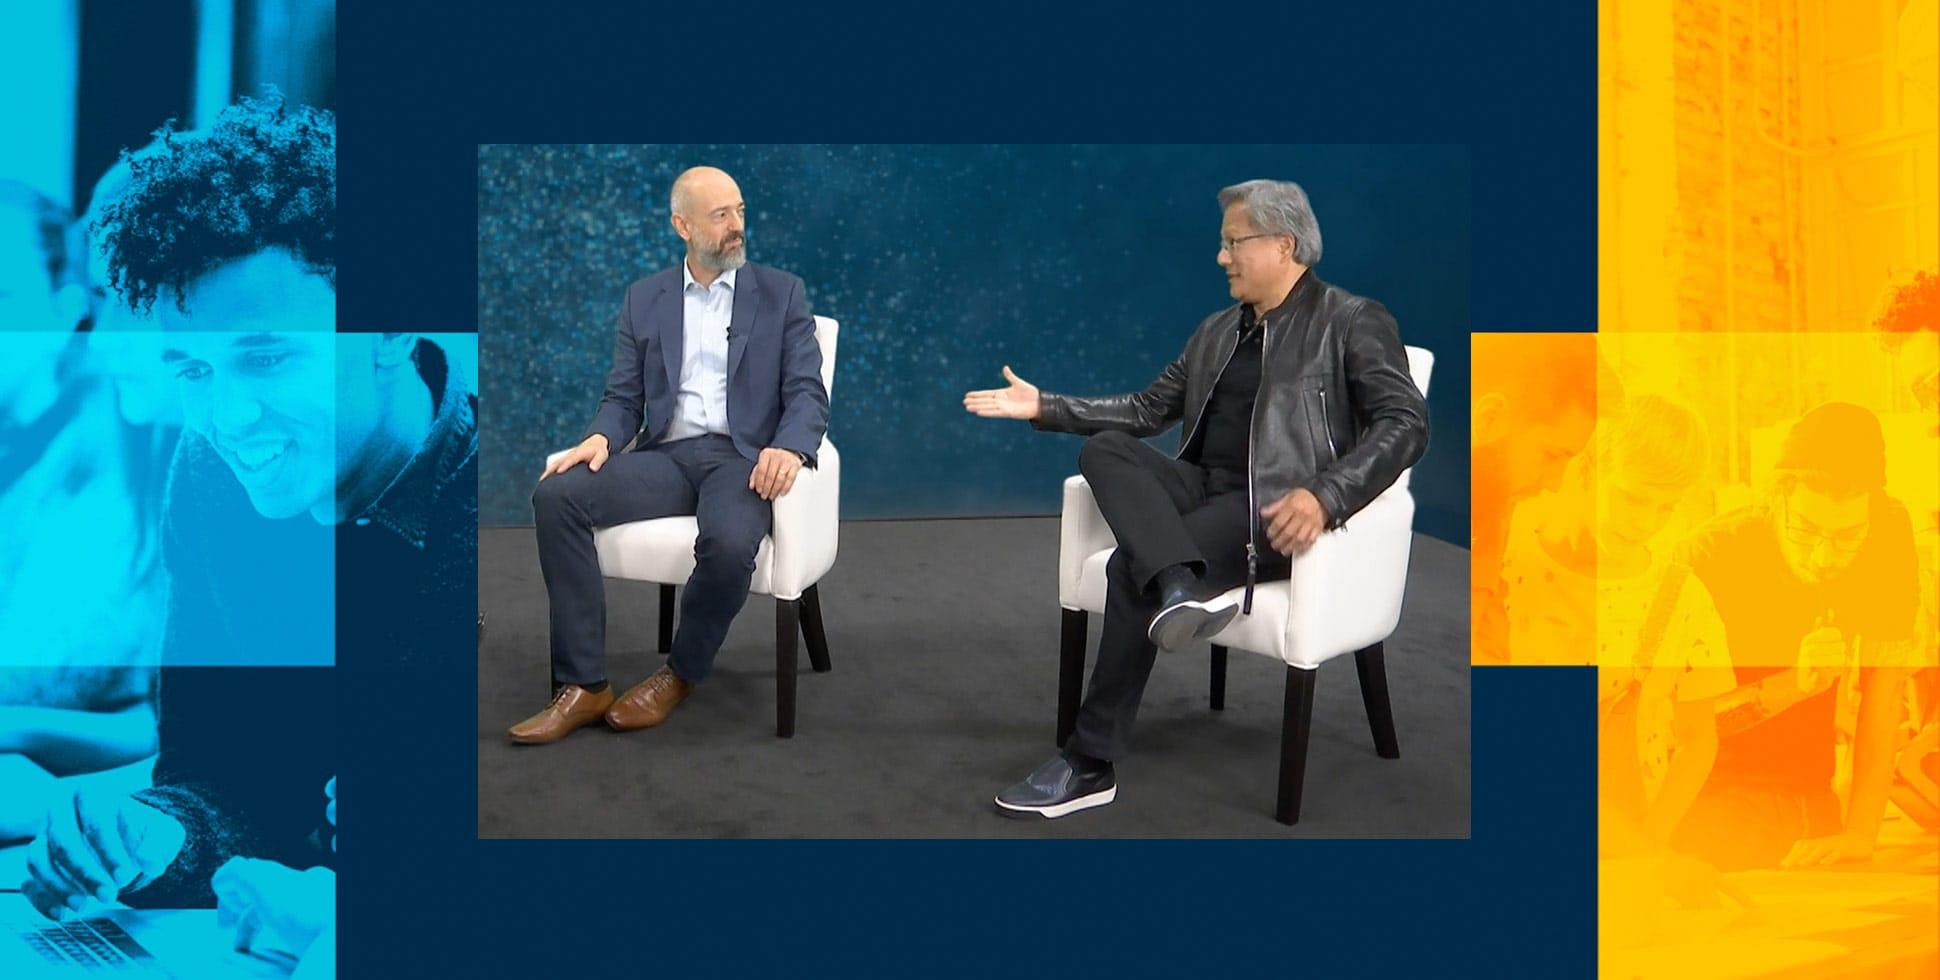 Watch Simon Segars's and Jensen Huang's Fireside Chat at Arm DevSummit